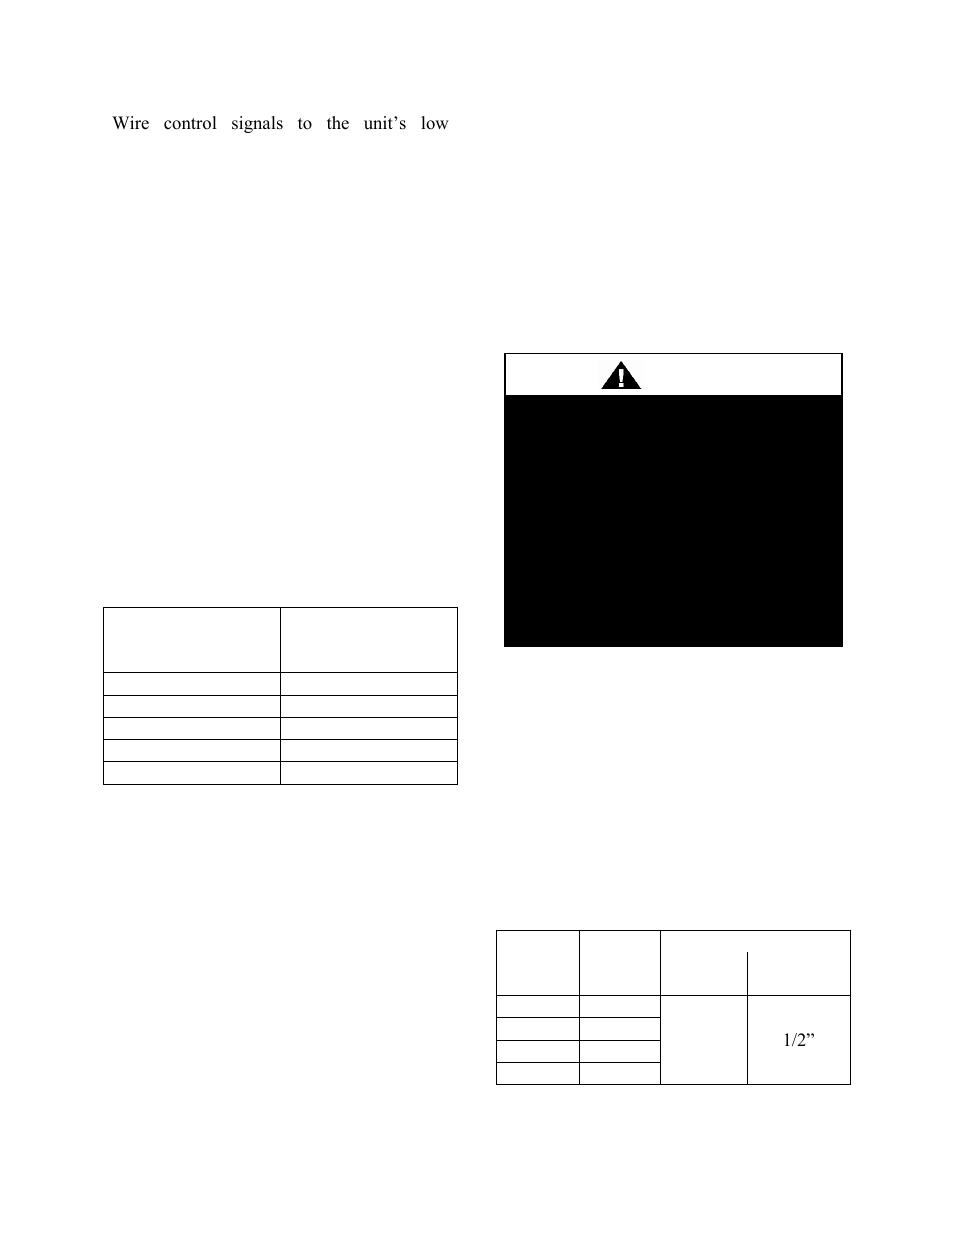 gm wiring schematics online thermostat control wiring, gas heating, table 4 - control wiring   aaon rq-006 user manual ...